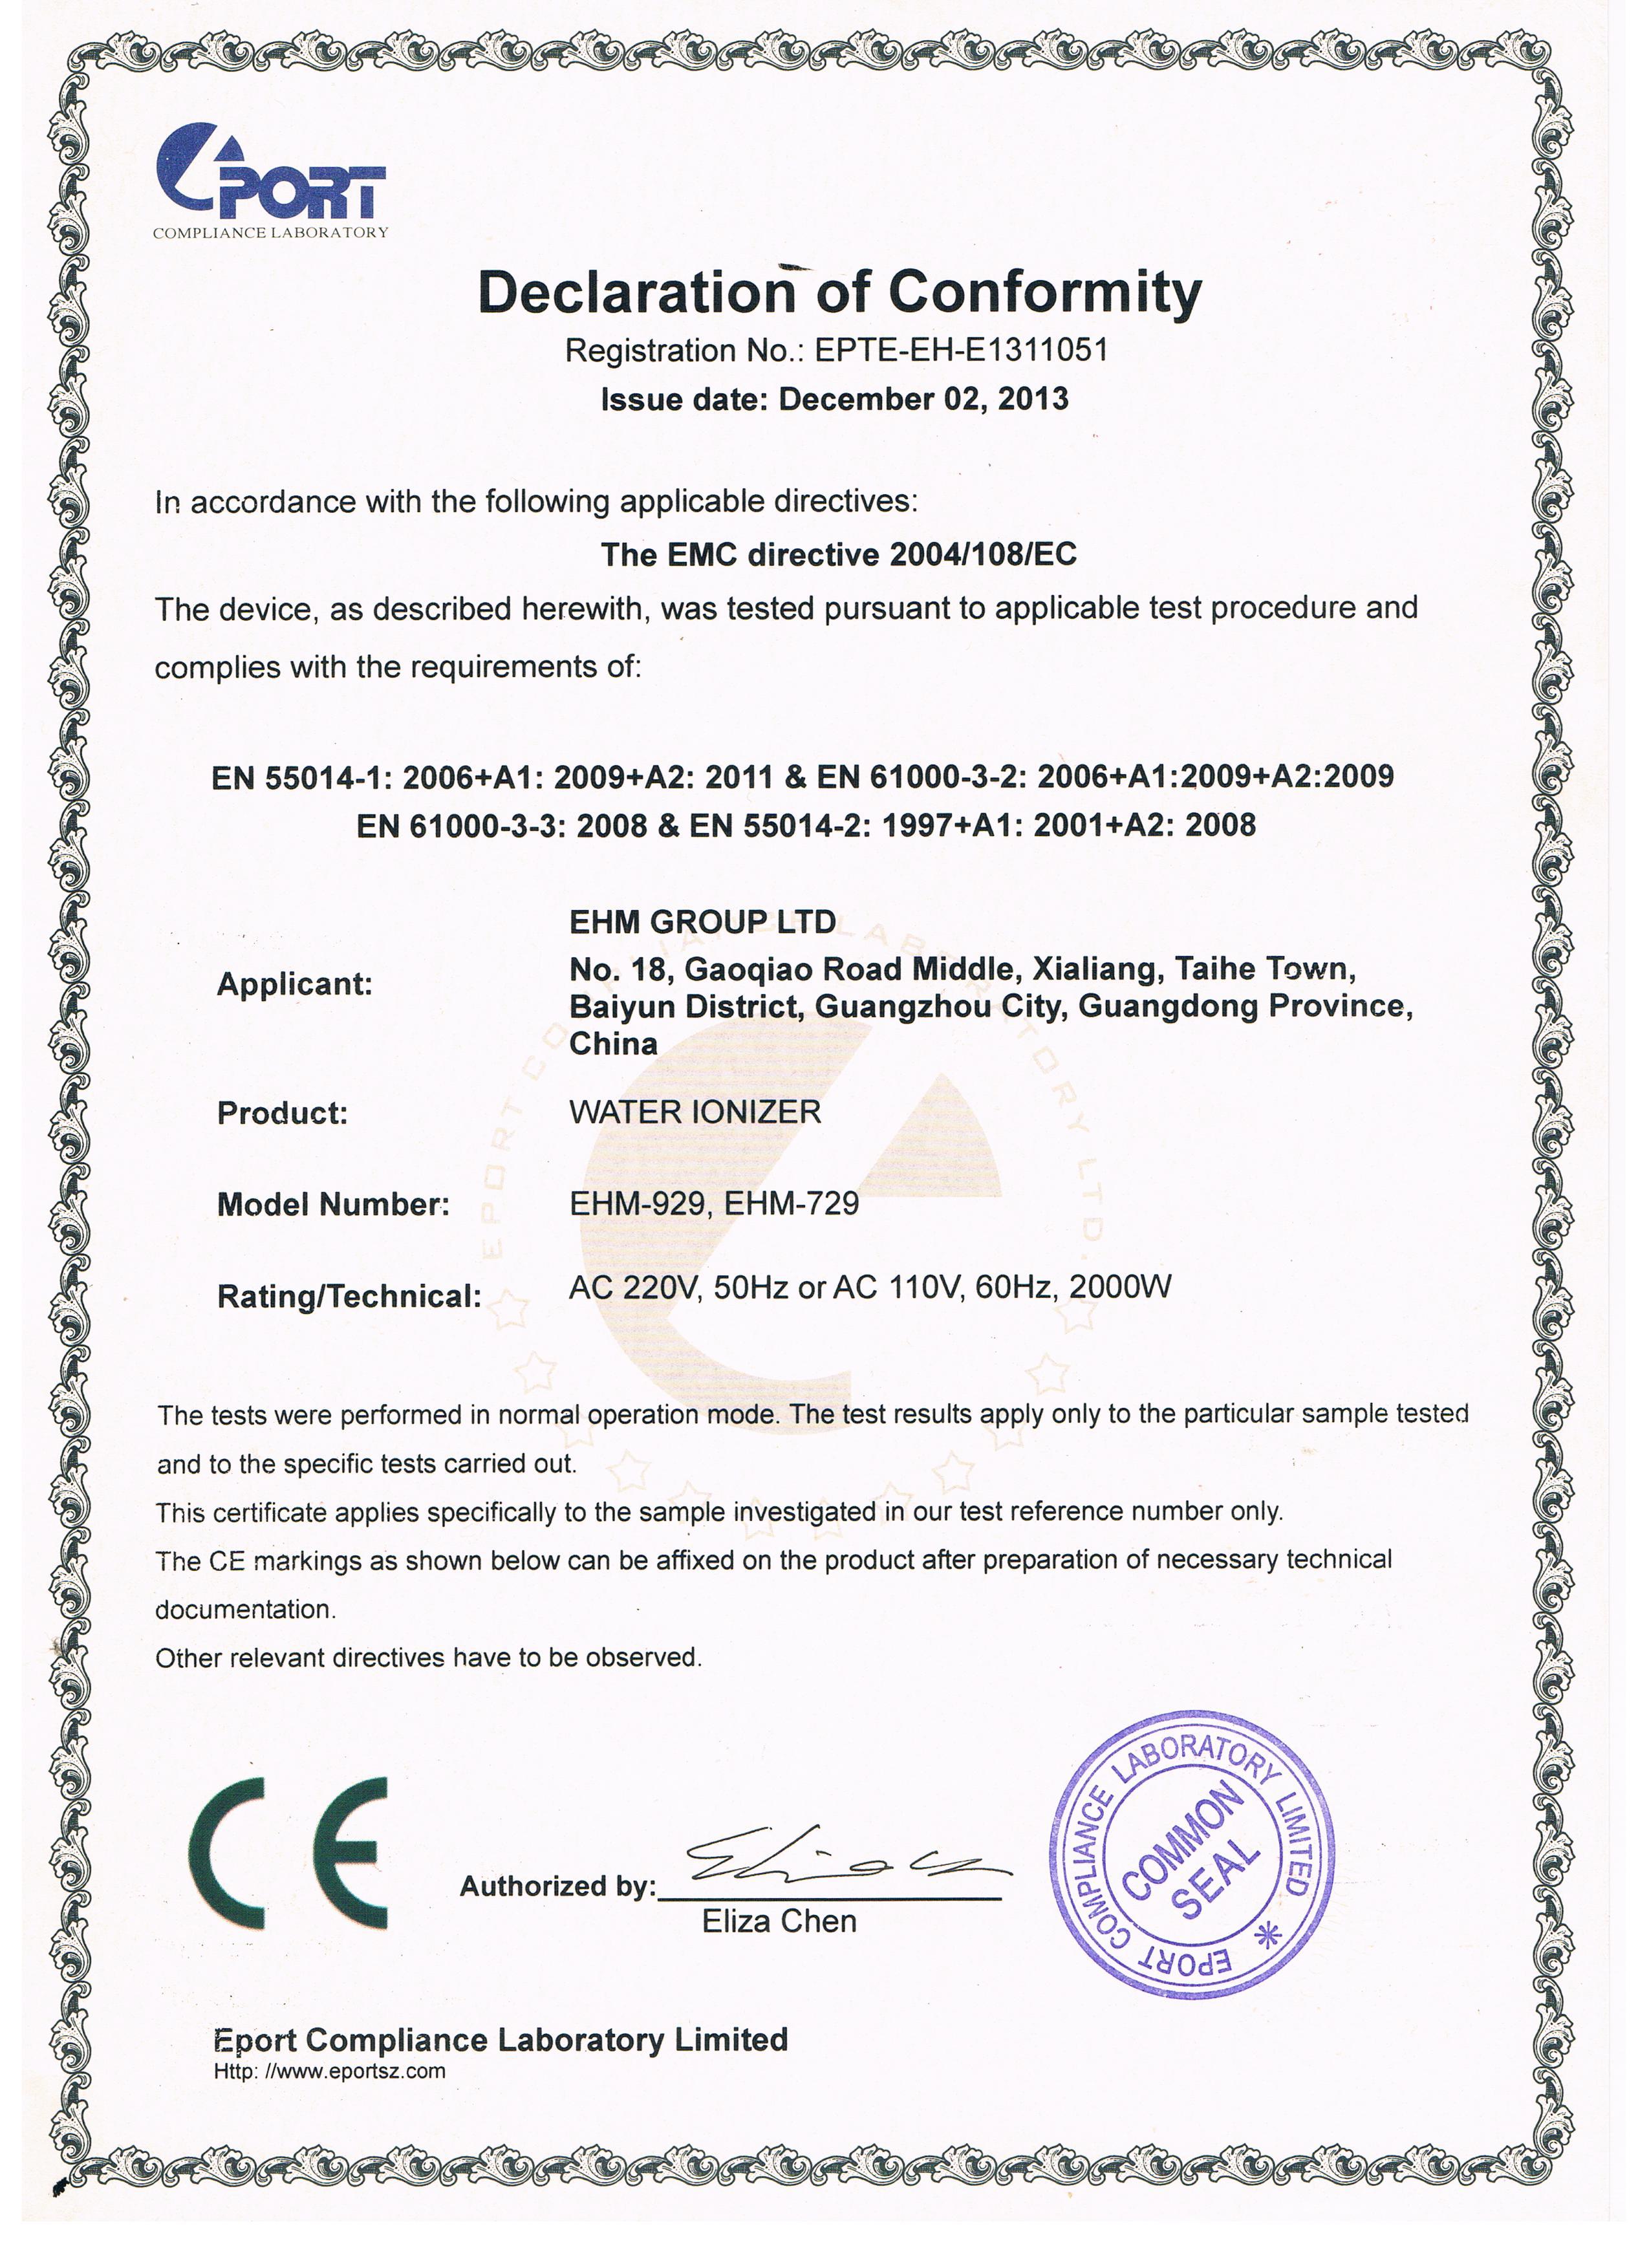 ce-certificate-ehm-water-ionizer-emc-.jpg